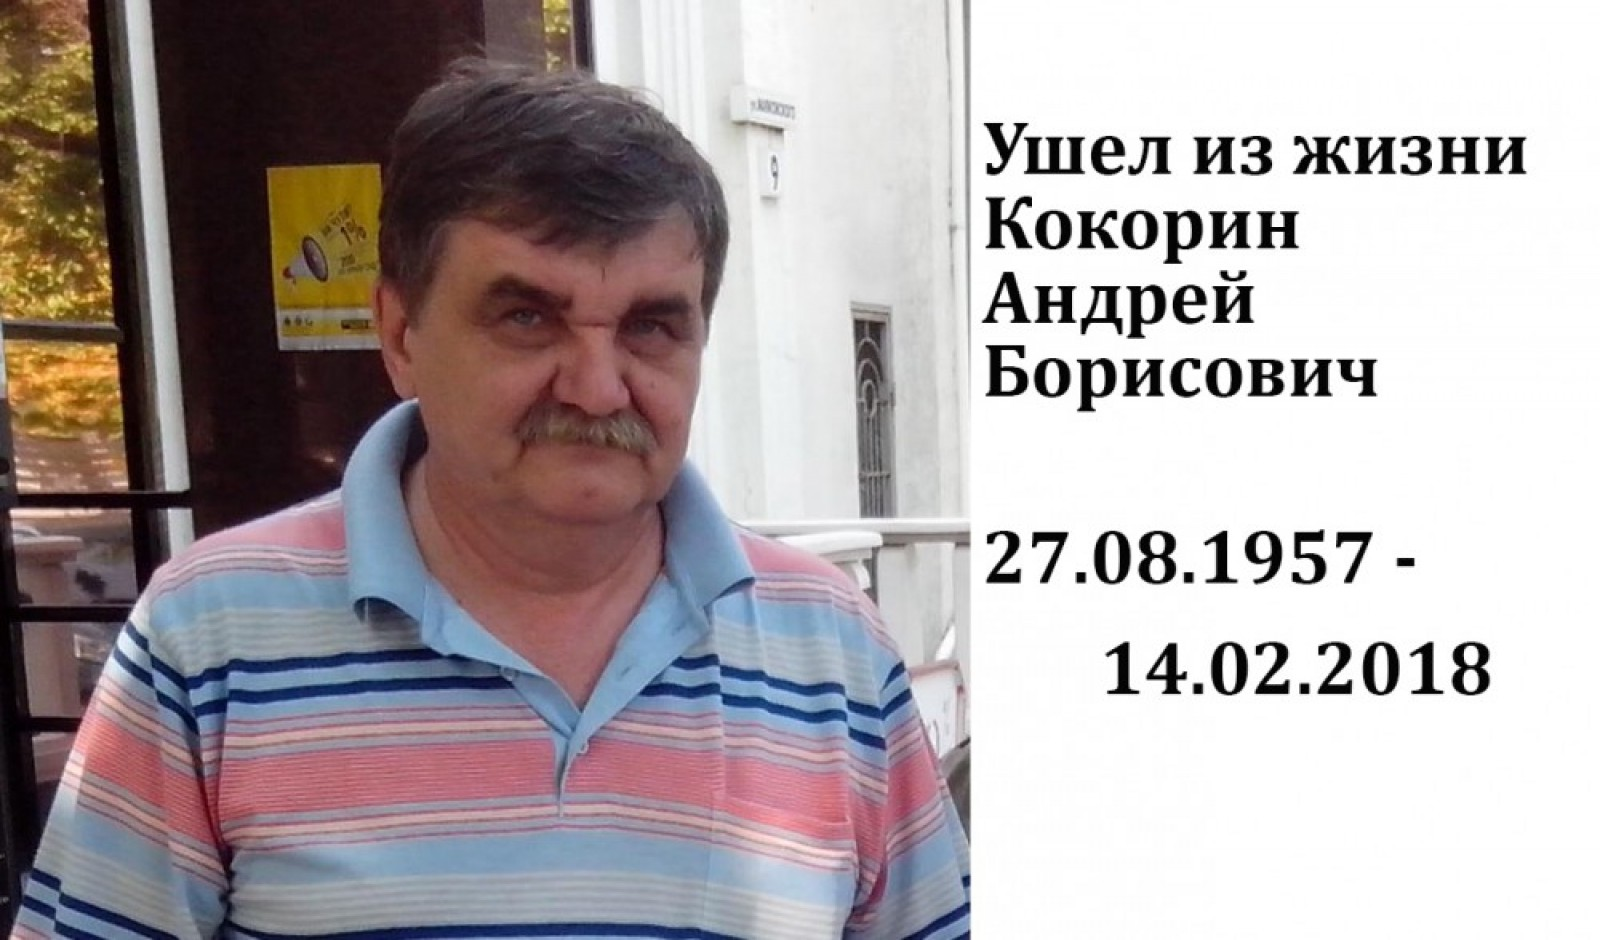 Фото новости - Ушел из жизни Кокорин Андрей Борисович